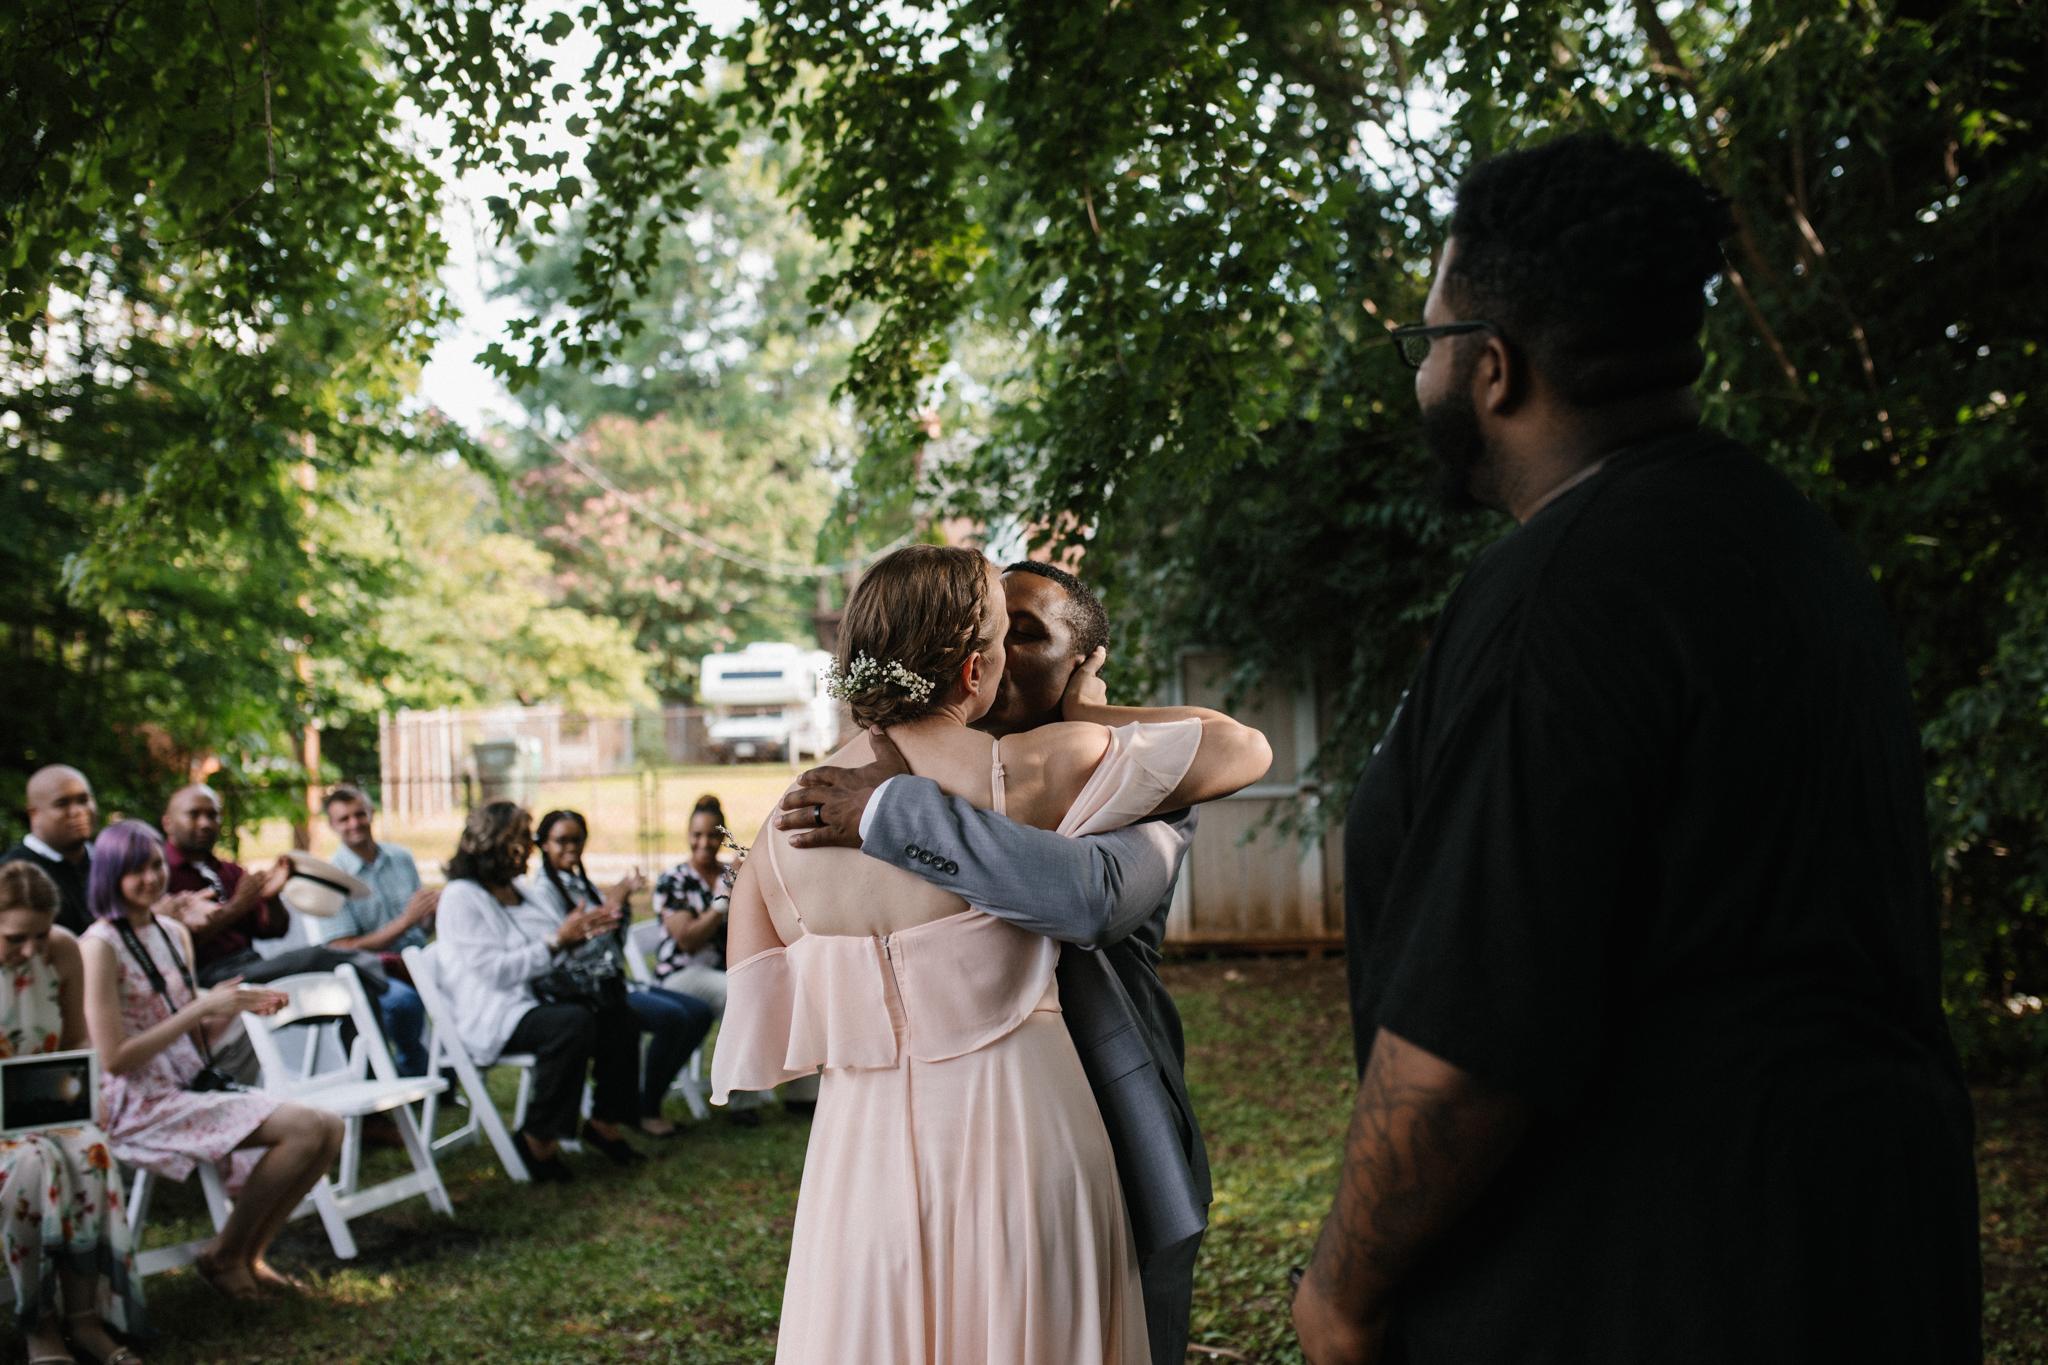 dorota_dwight_richmond_backyard_wedding-48.jpg